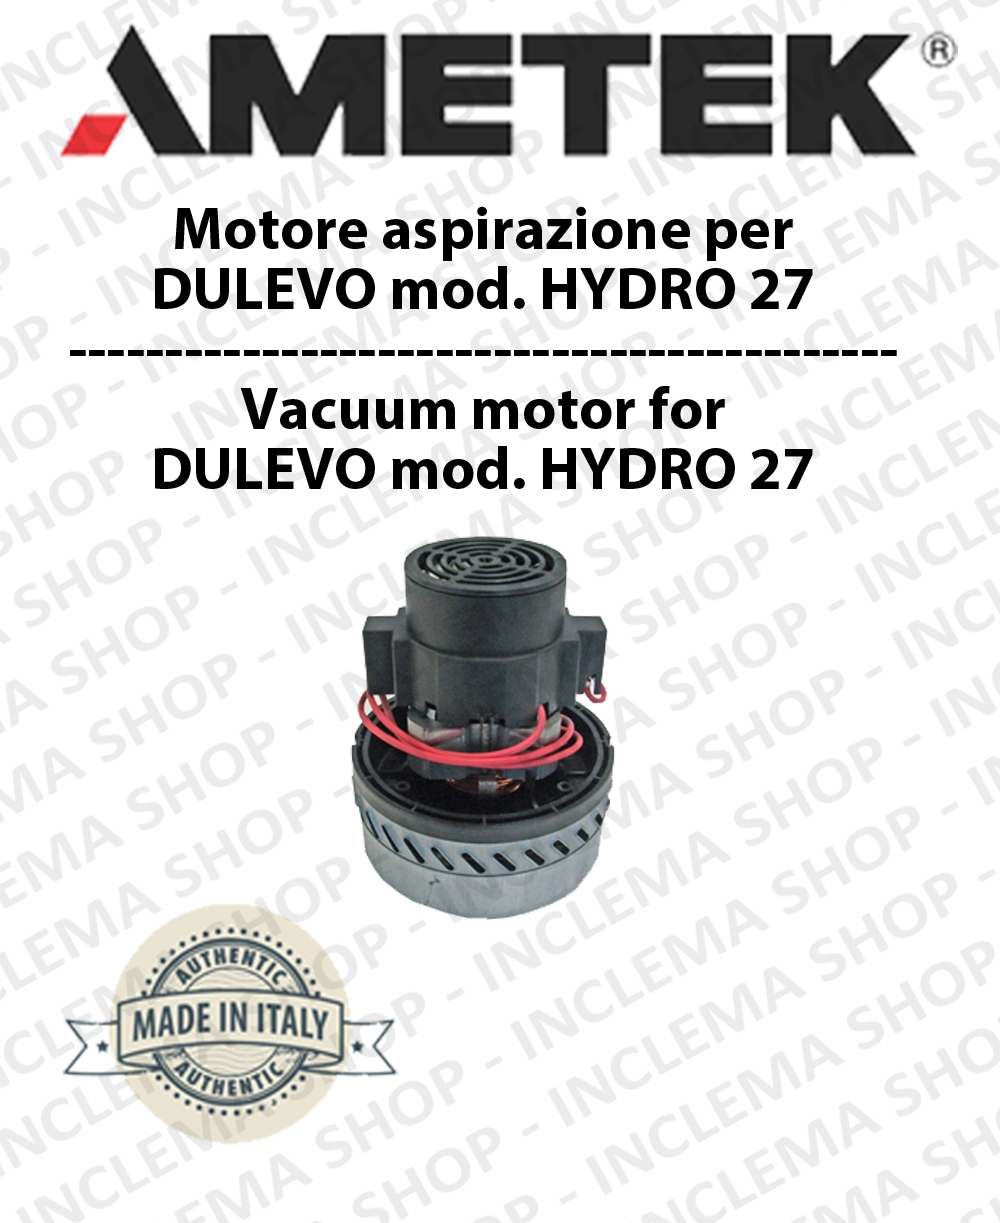 HYDRO 27 - Motore Aspirazione AMETEK ITALIA per lavapavimenti DULEVO